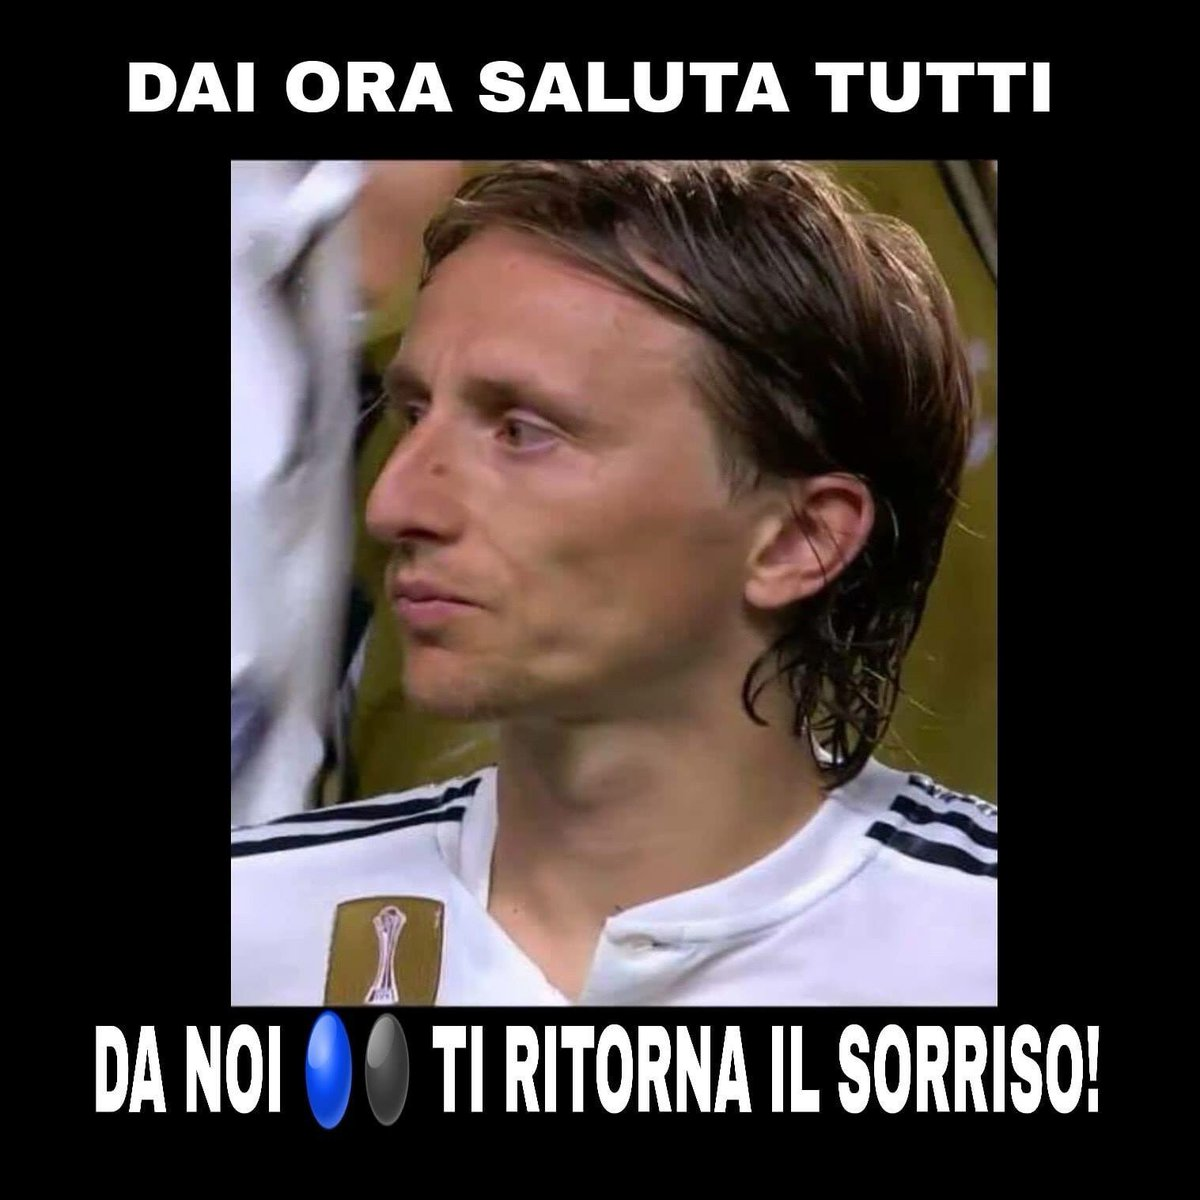 Saluta tutti e bye bye...  Ti stiamo aspettando @lukamodric10!#Modric #Inter  - Ukustom